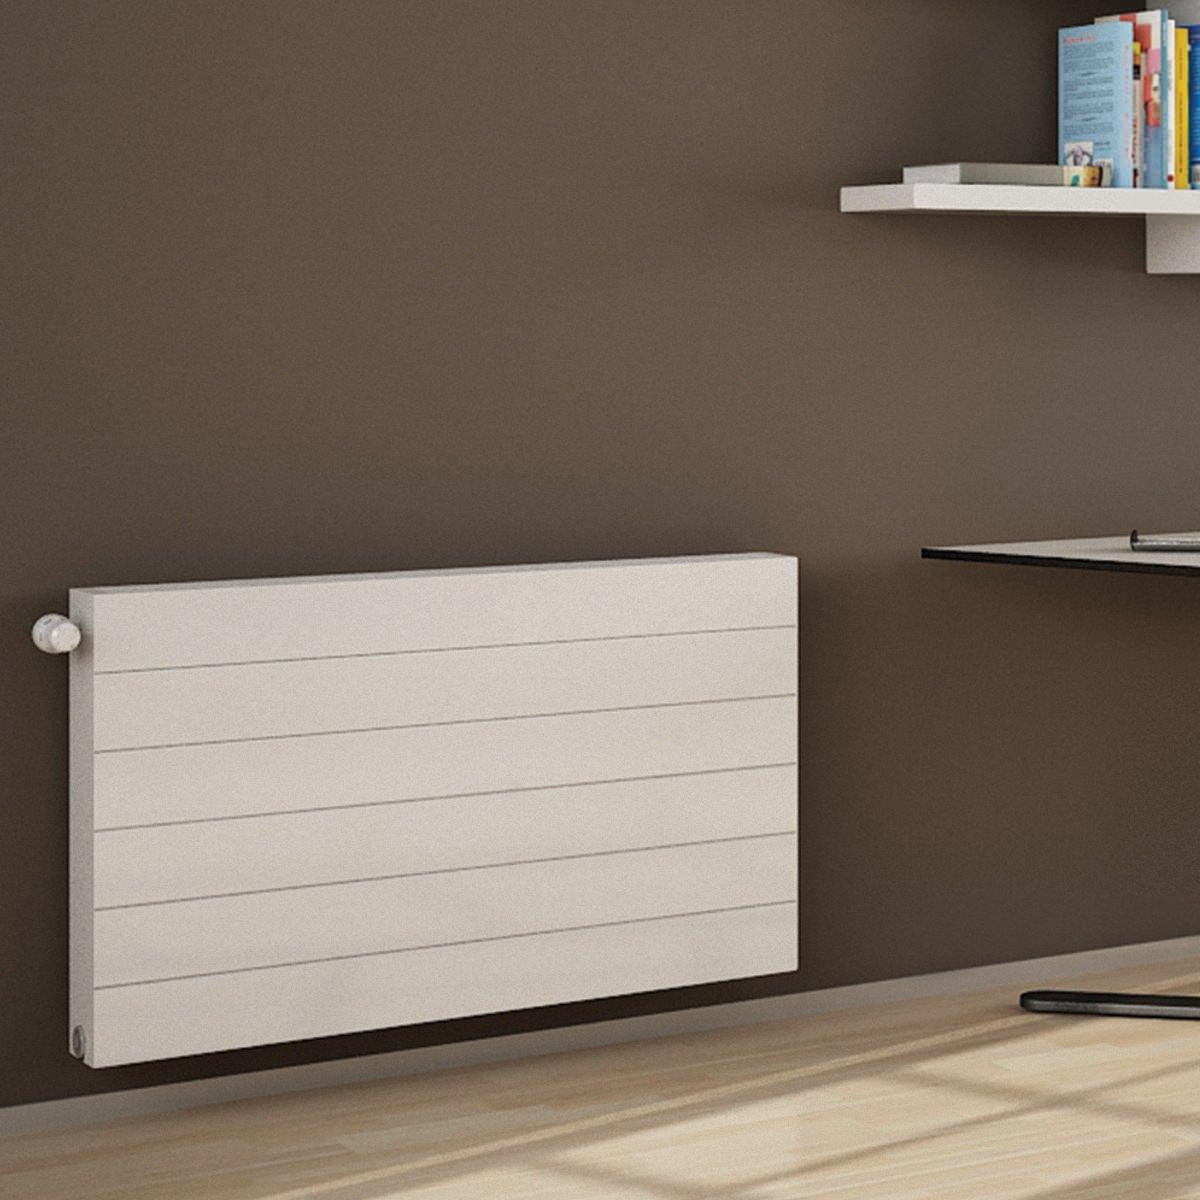 Bath Shower Thermostatic Mixer Taps Kartell K Flat Premium Kompact Horizontal Double Convector